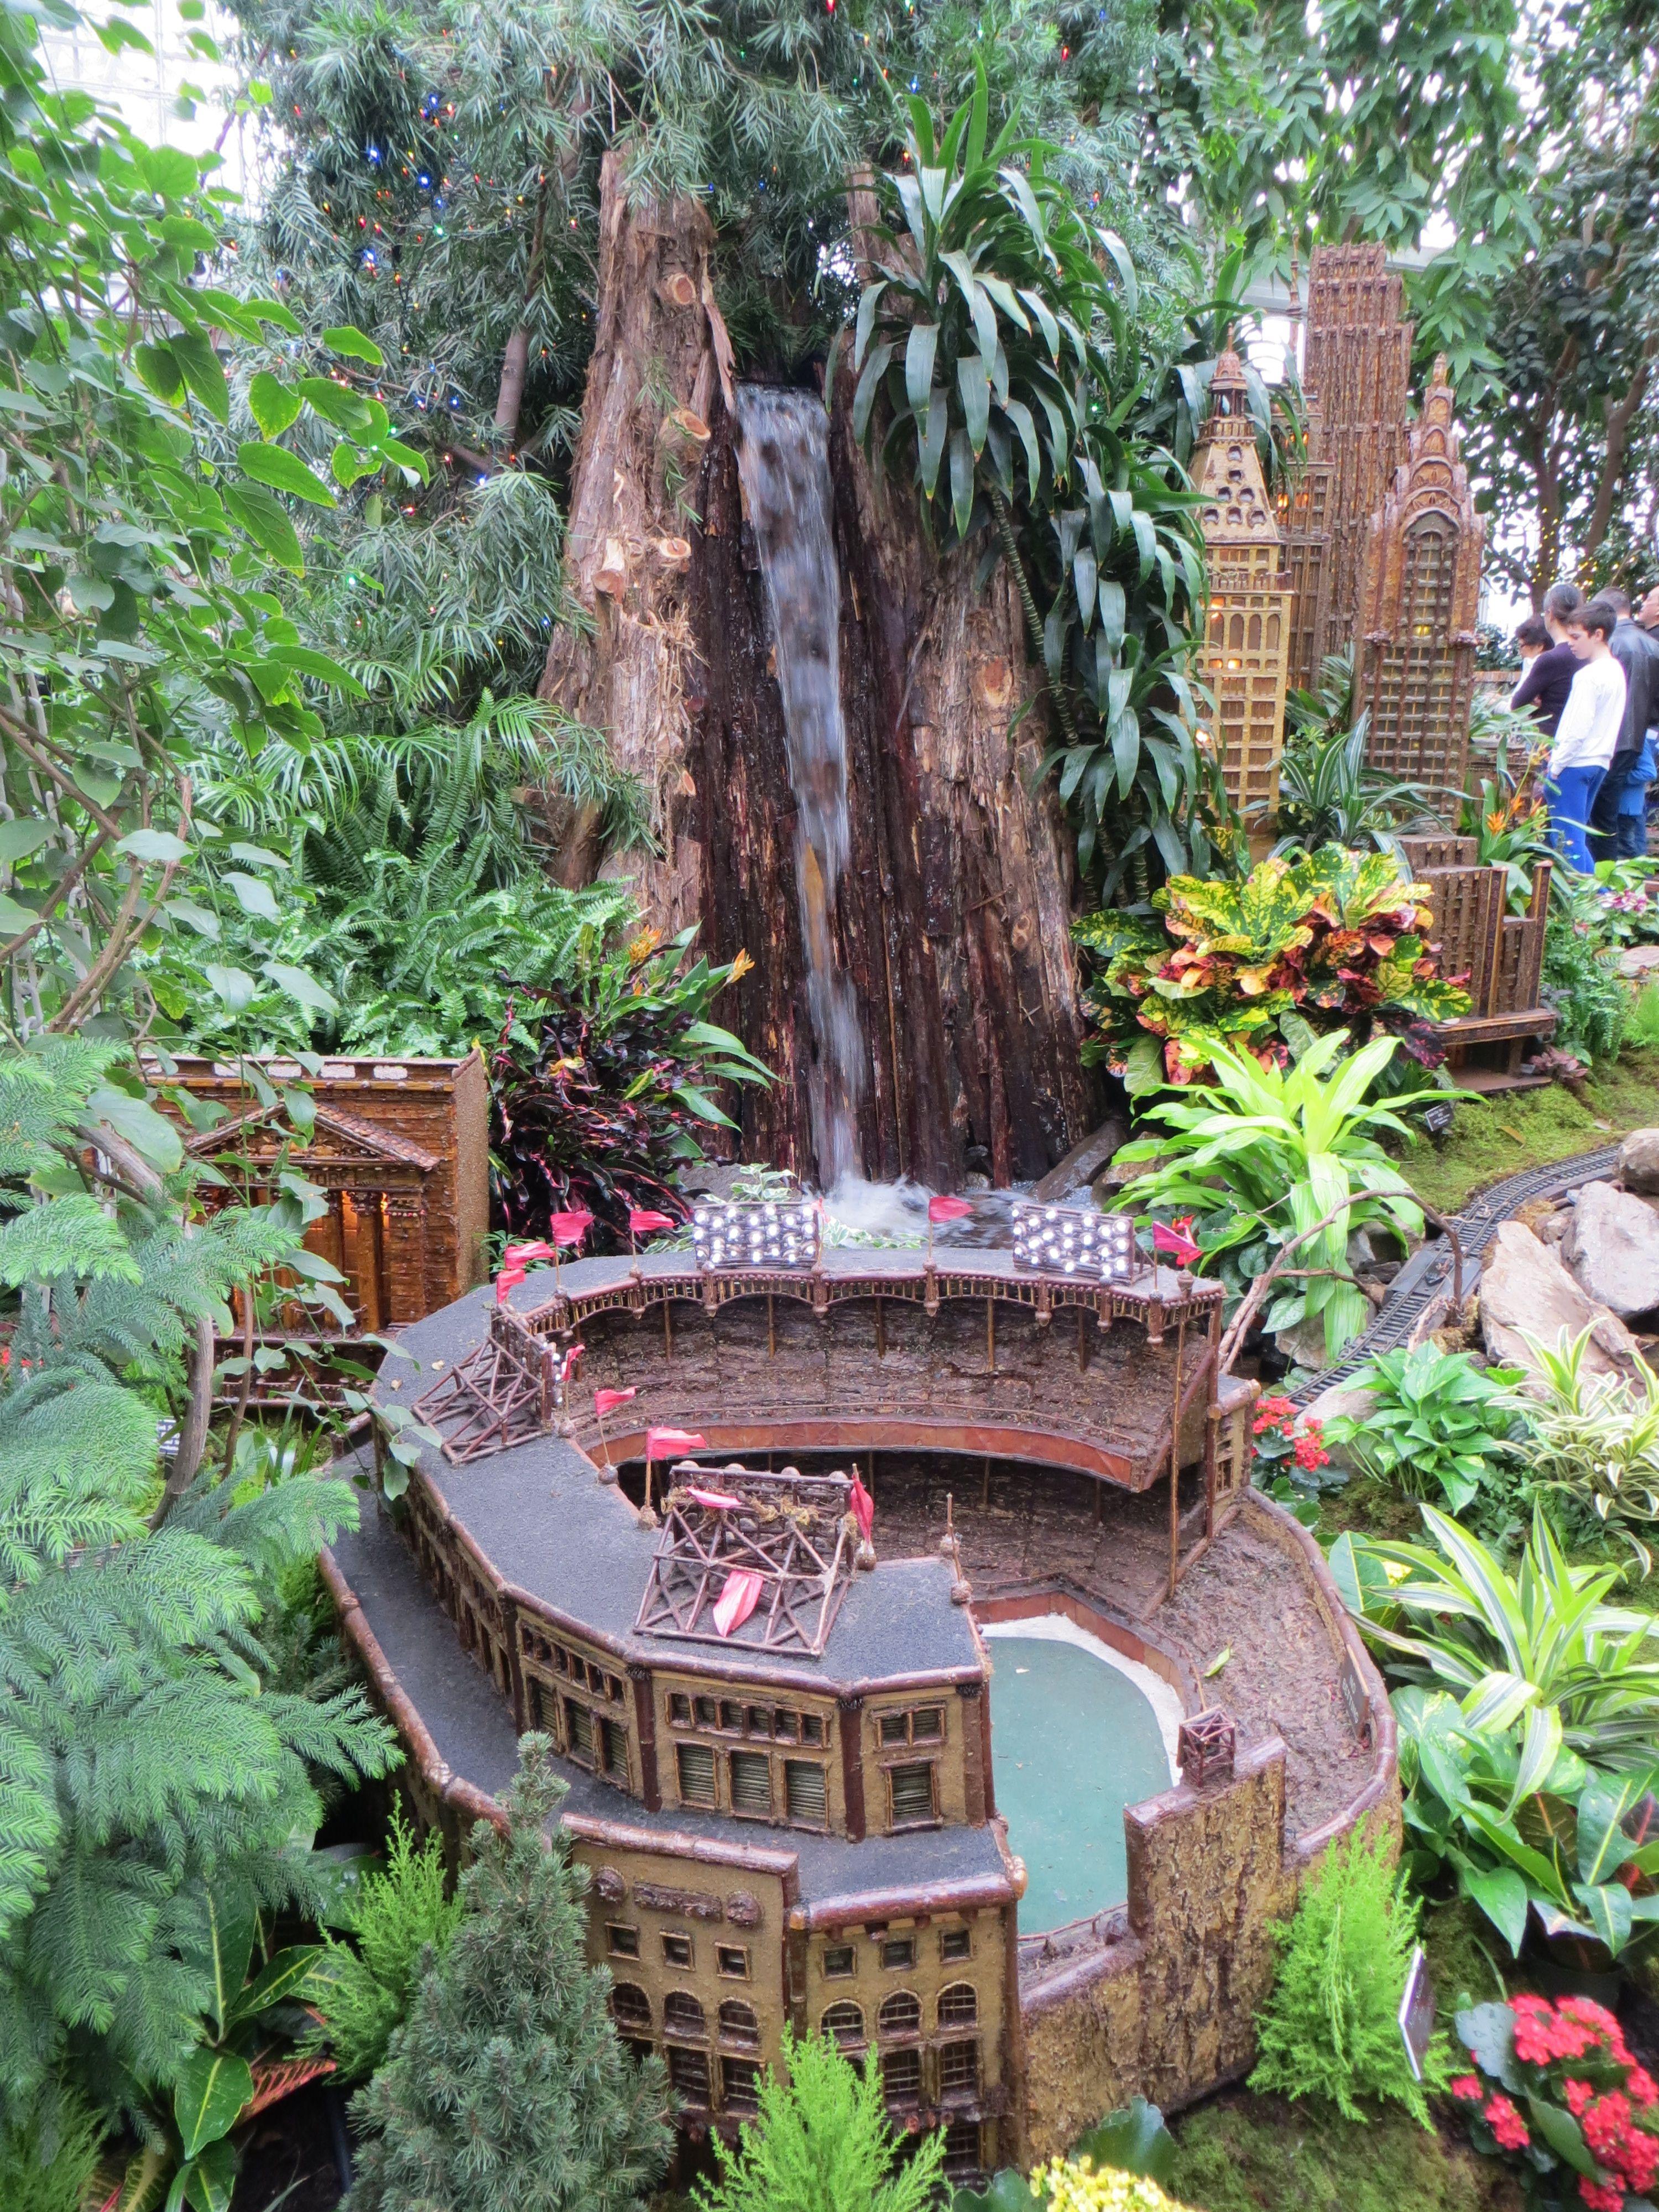 2da80b11d0182d70b28a55a57e6abd4b - Holiday Train Show Ny Botanical Gardens